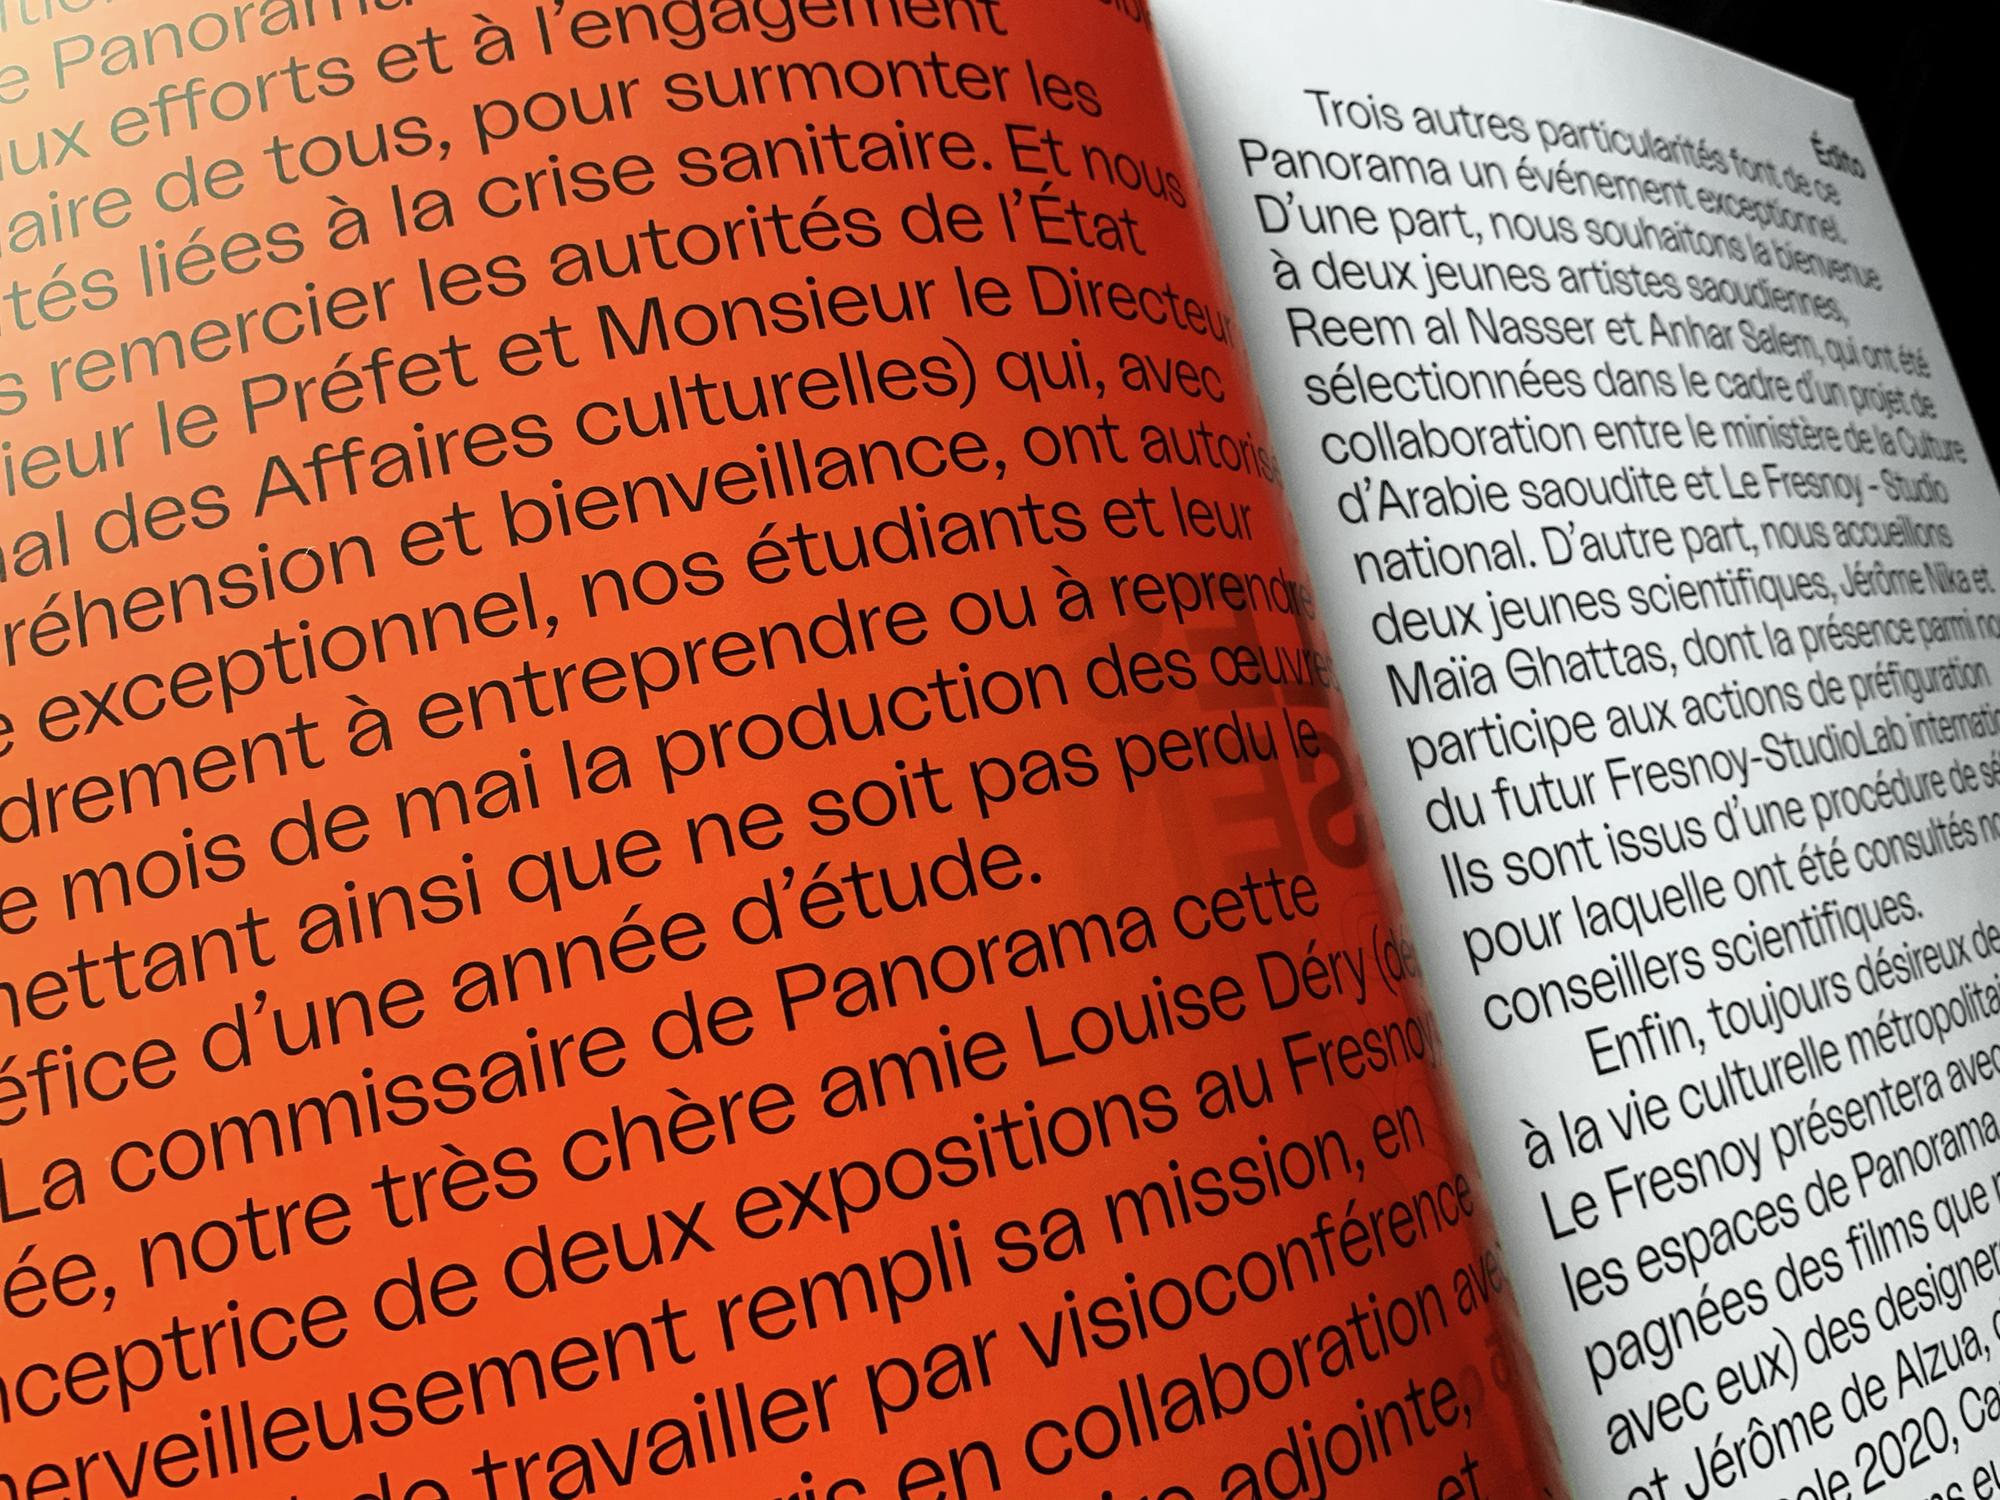 S_Fresnoy_Marc Andre Roy_Design_014